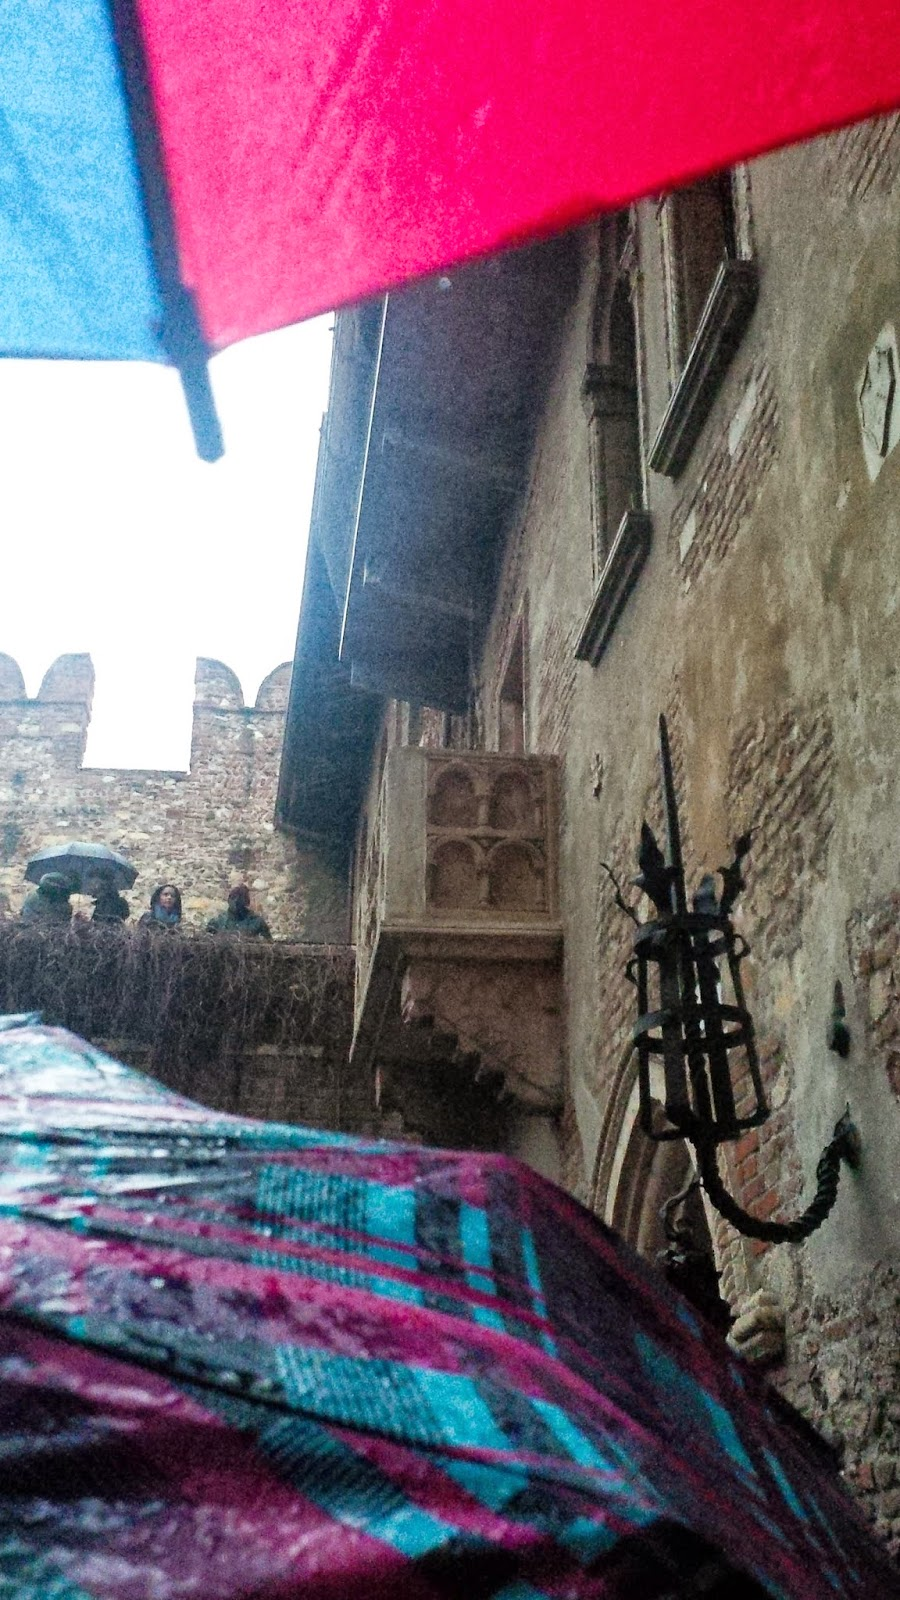 Juliet's Balcony - St. Valentine's Day, Verona 2015